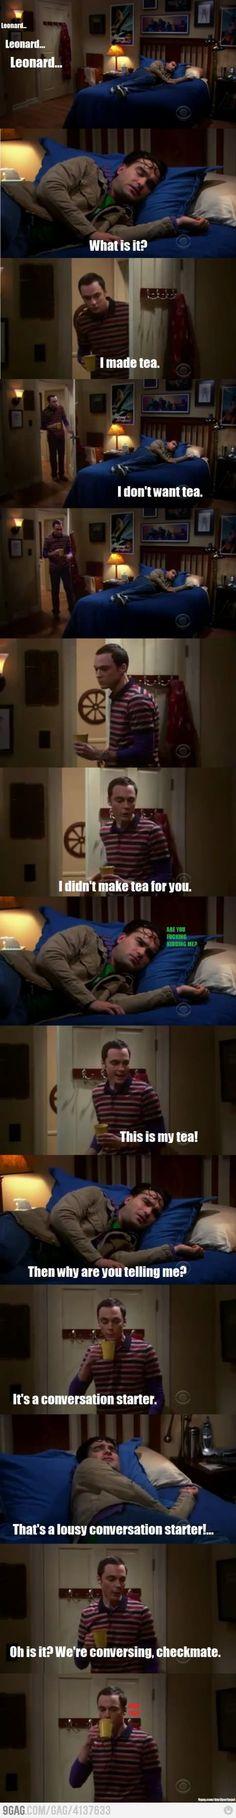 Sheldon Cooper Conversation Starter